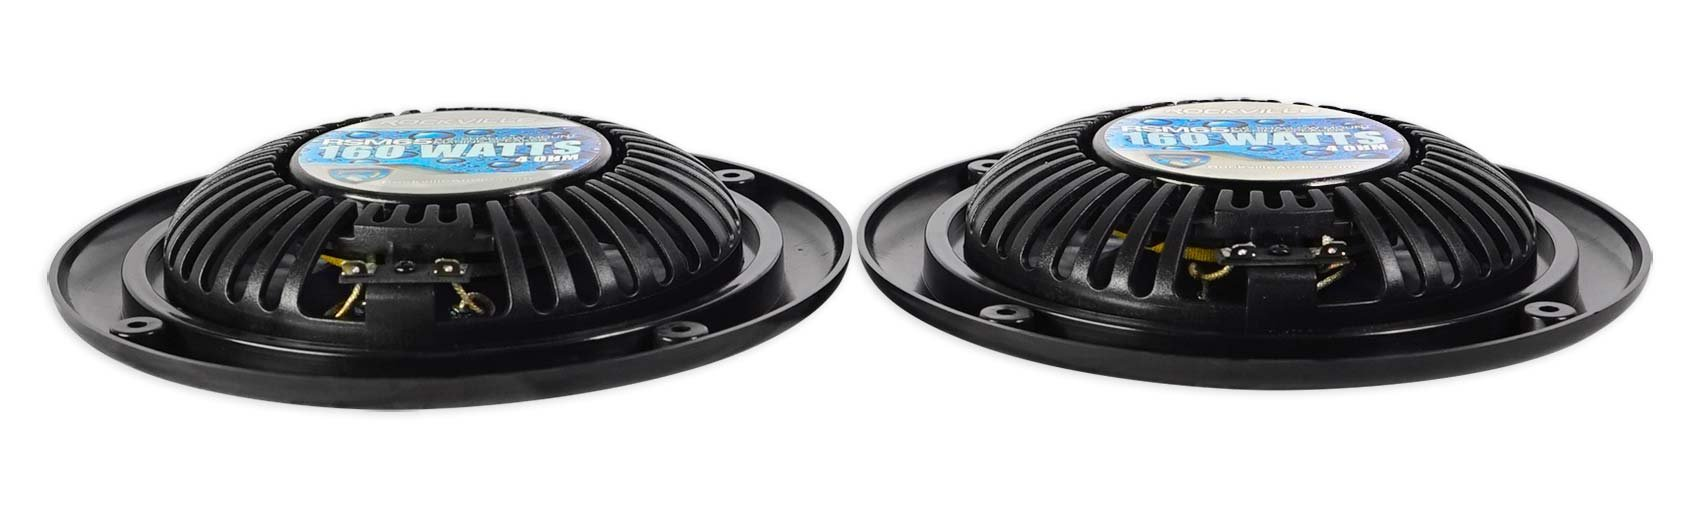 2 Rockville RSM65B 6.5'' 320w Waterproof Shallow Slim Speakers 4 RZR/ATV/UTV/Cart by Rockville (Image #6)